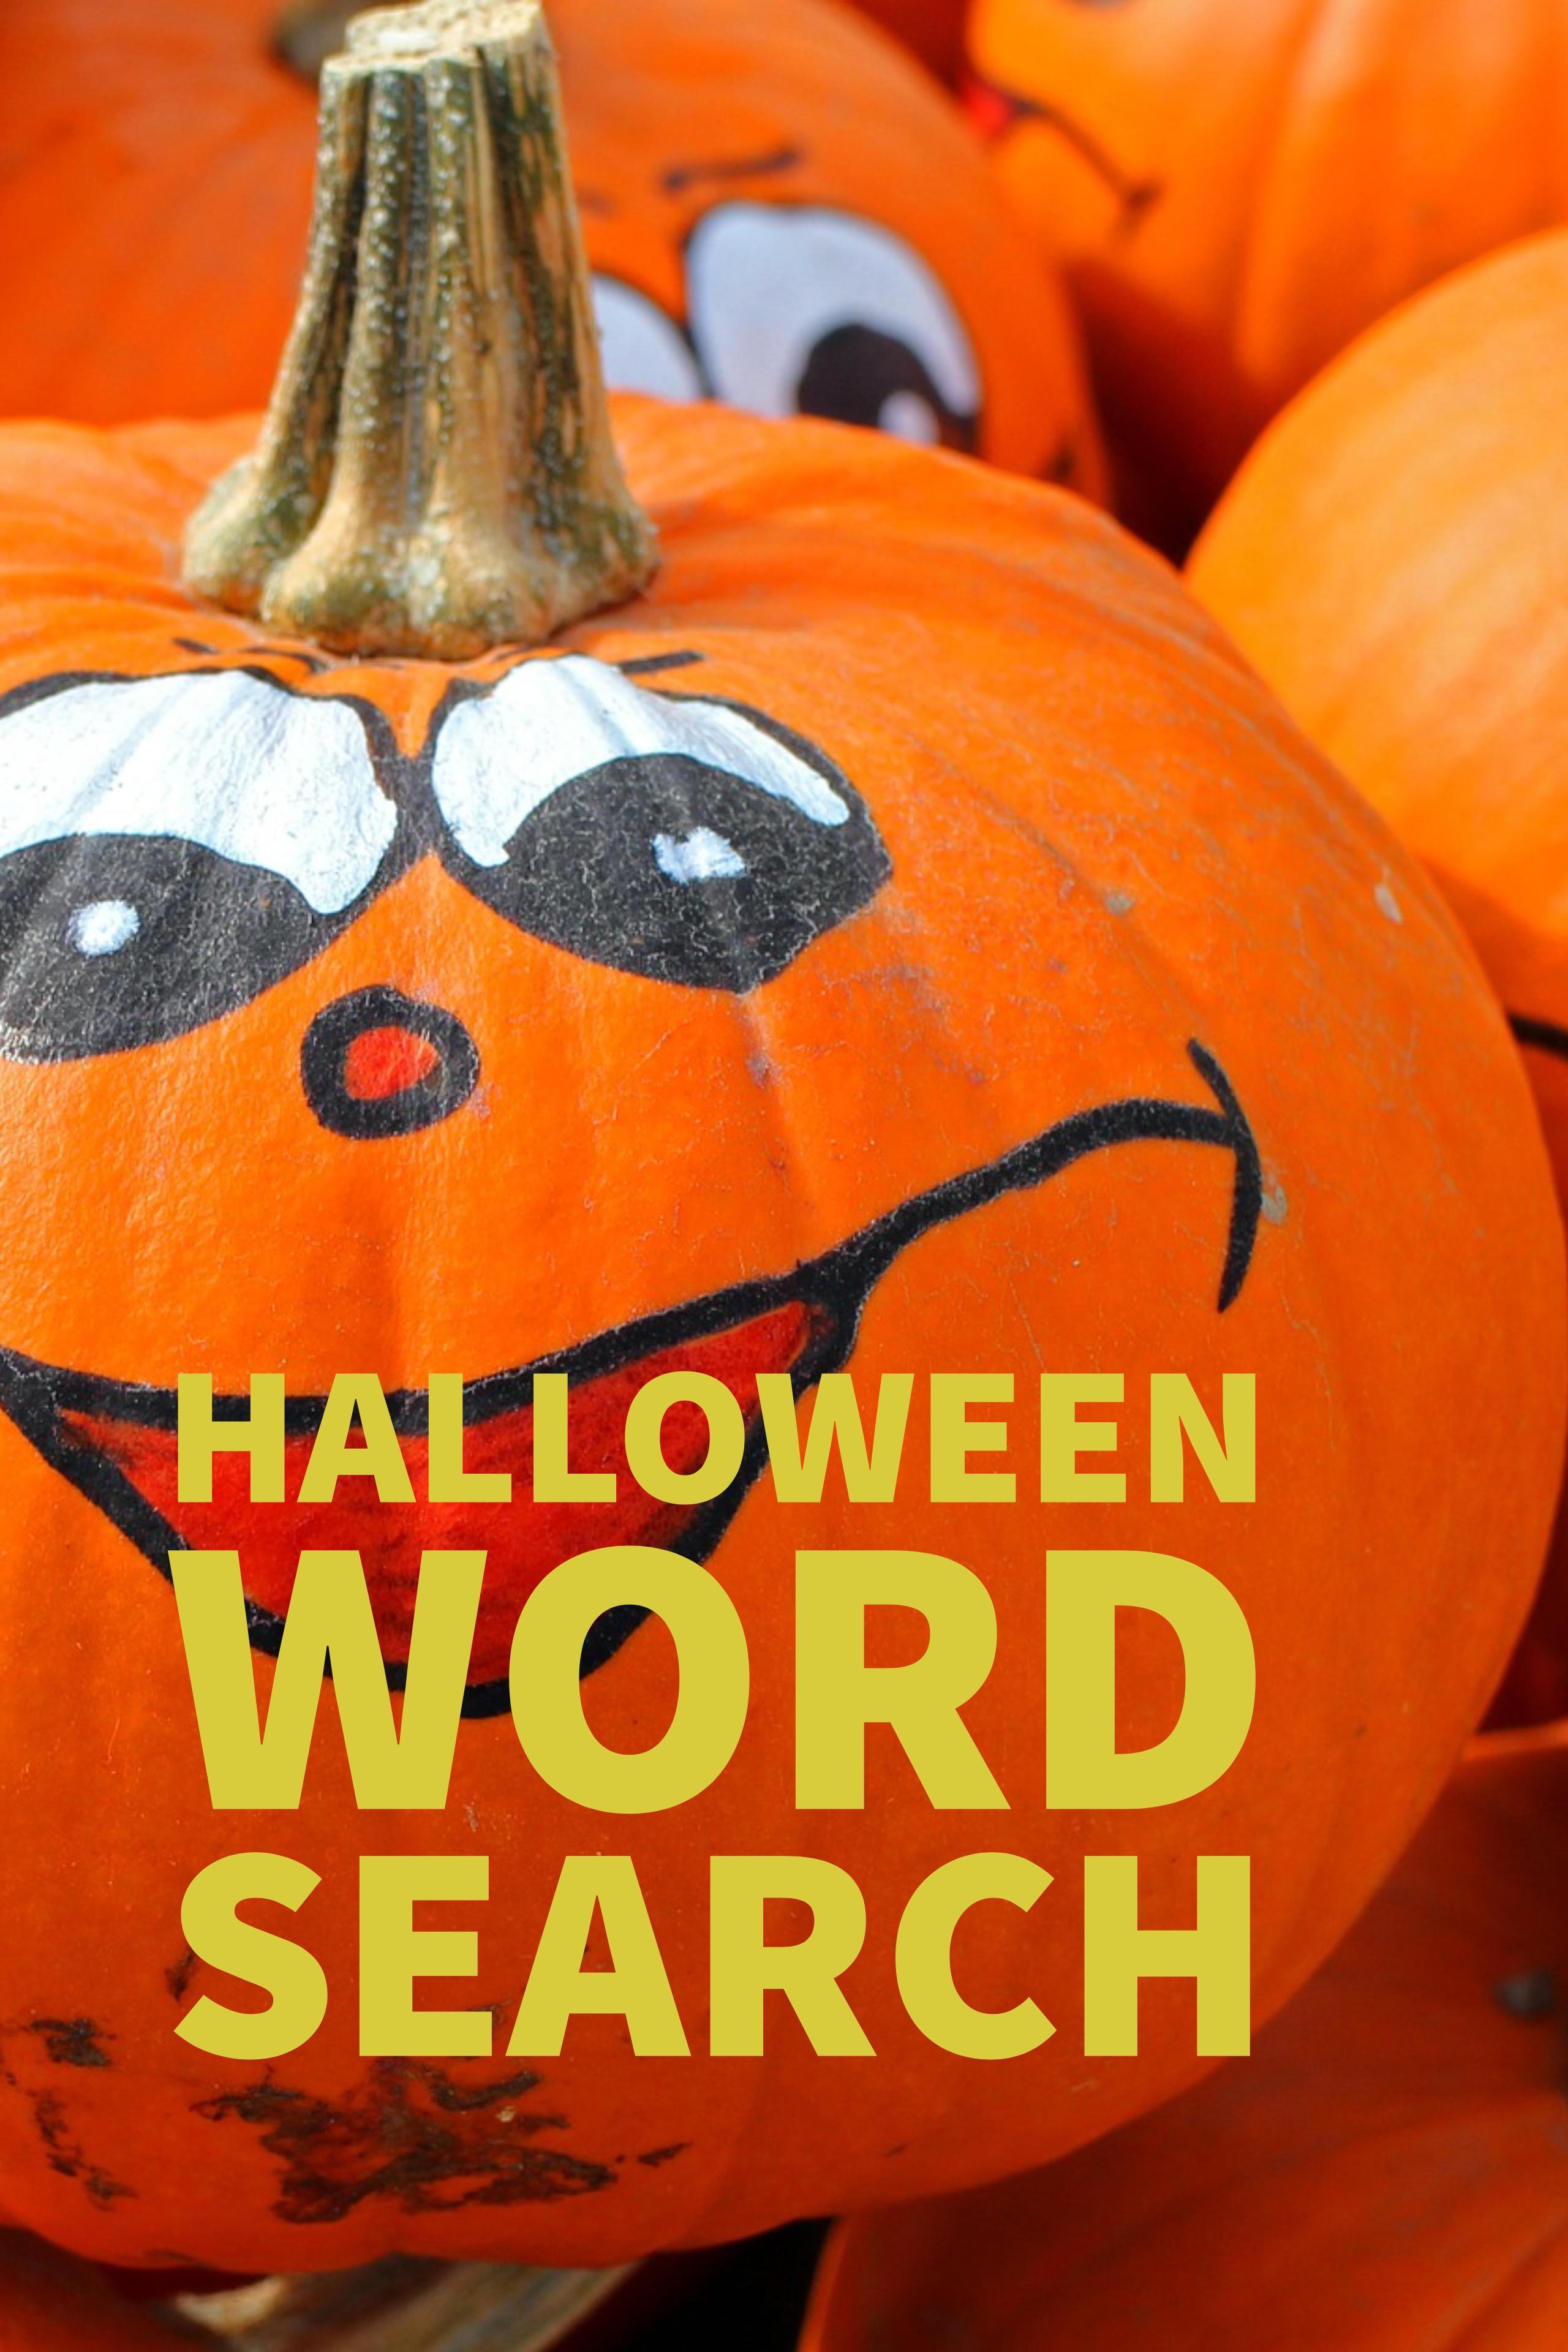 Halloween_word_search